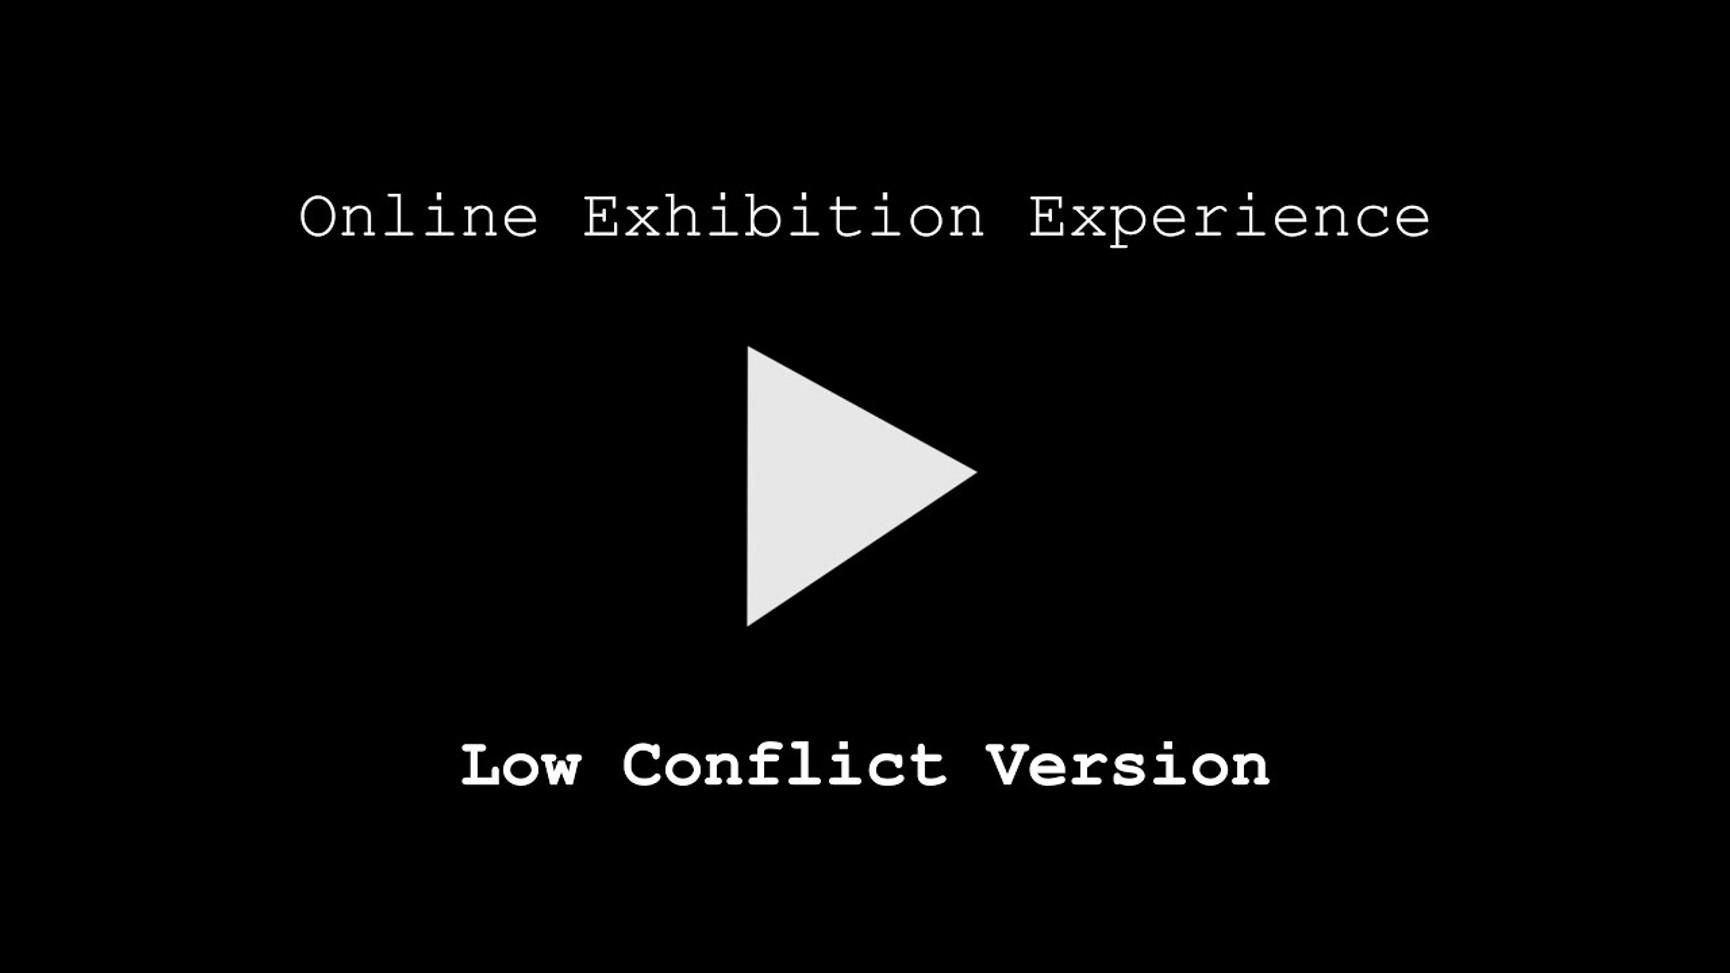 Low Conflict Version